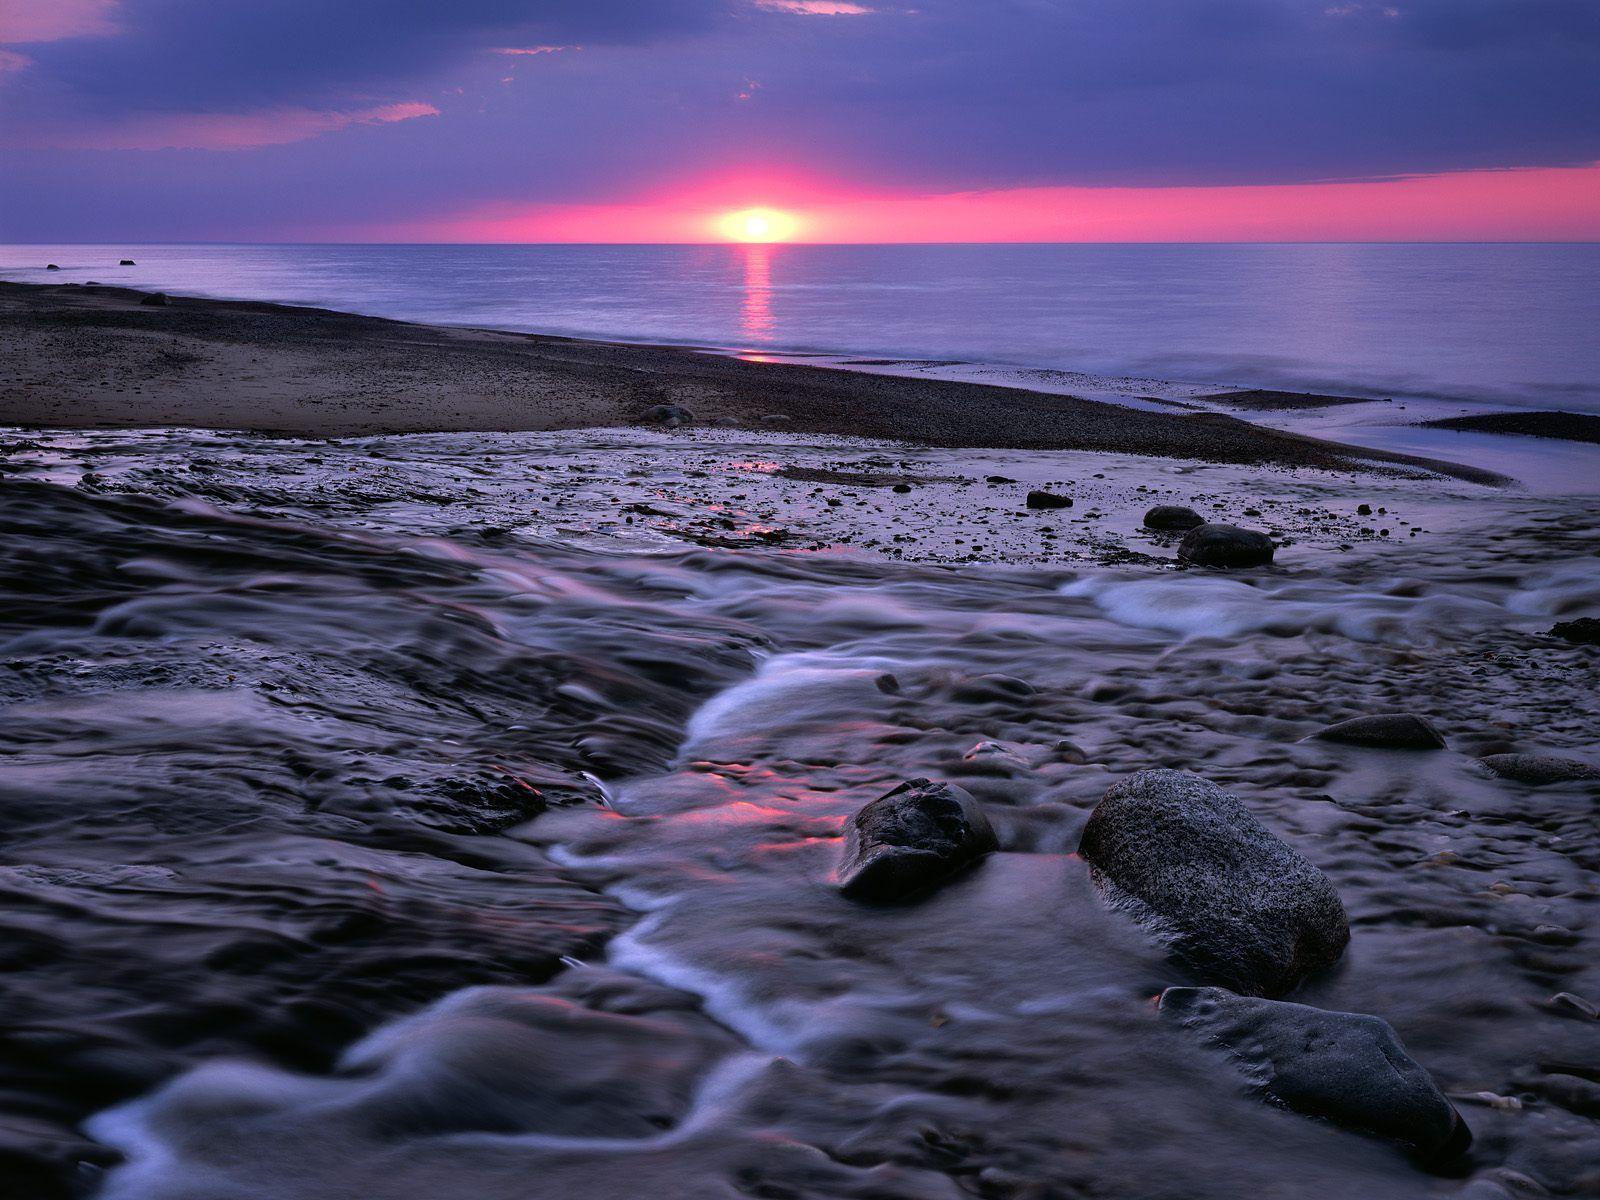 natural_hd_sunset_beach_wallpapers_and_desktop_backgrounds (6)